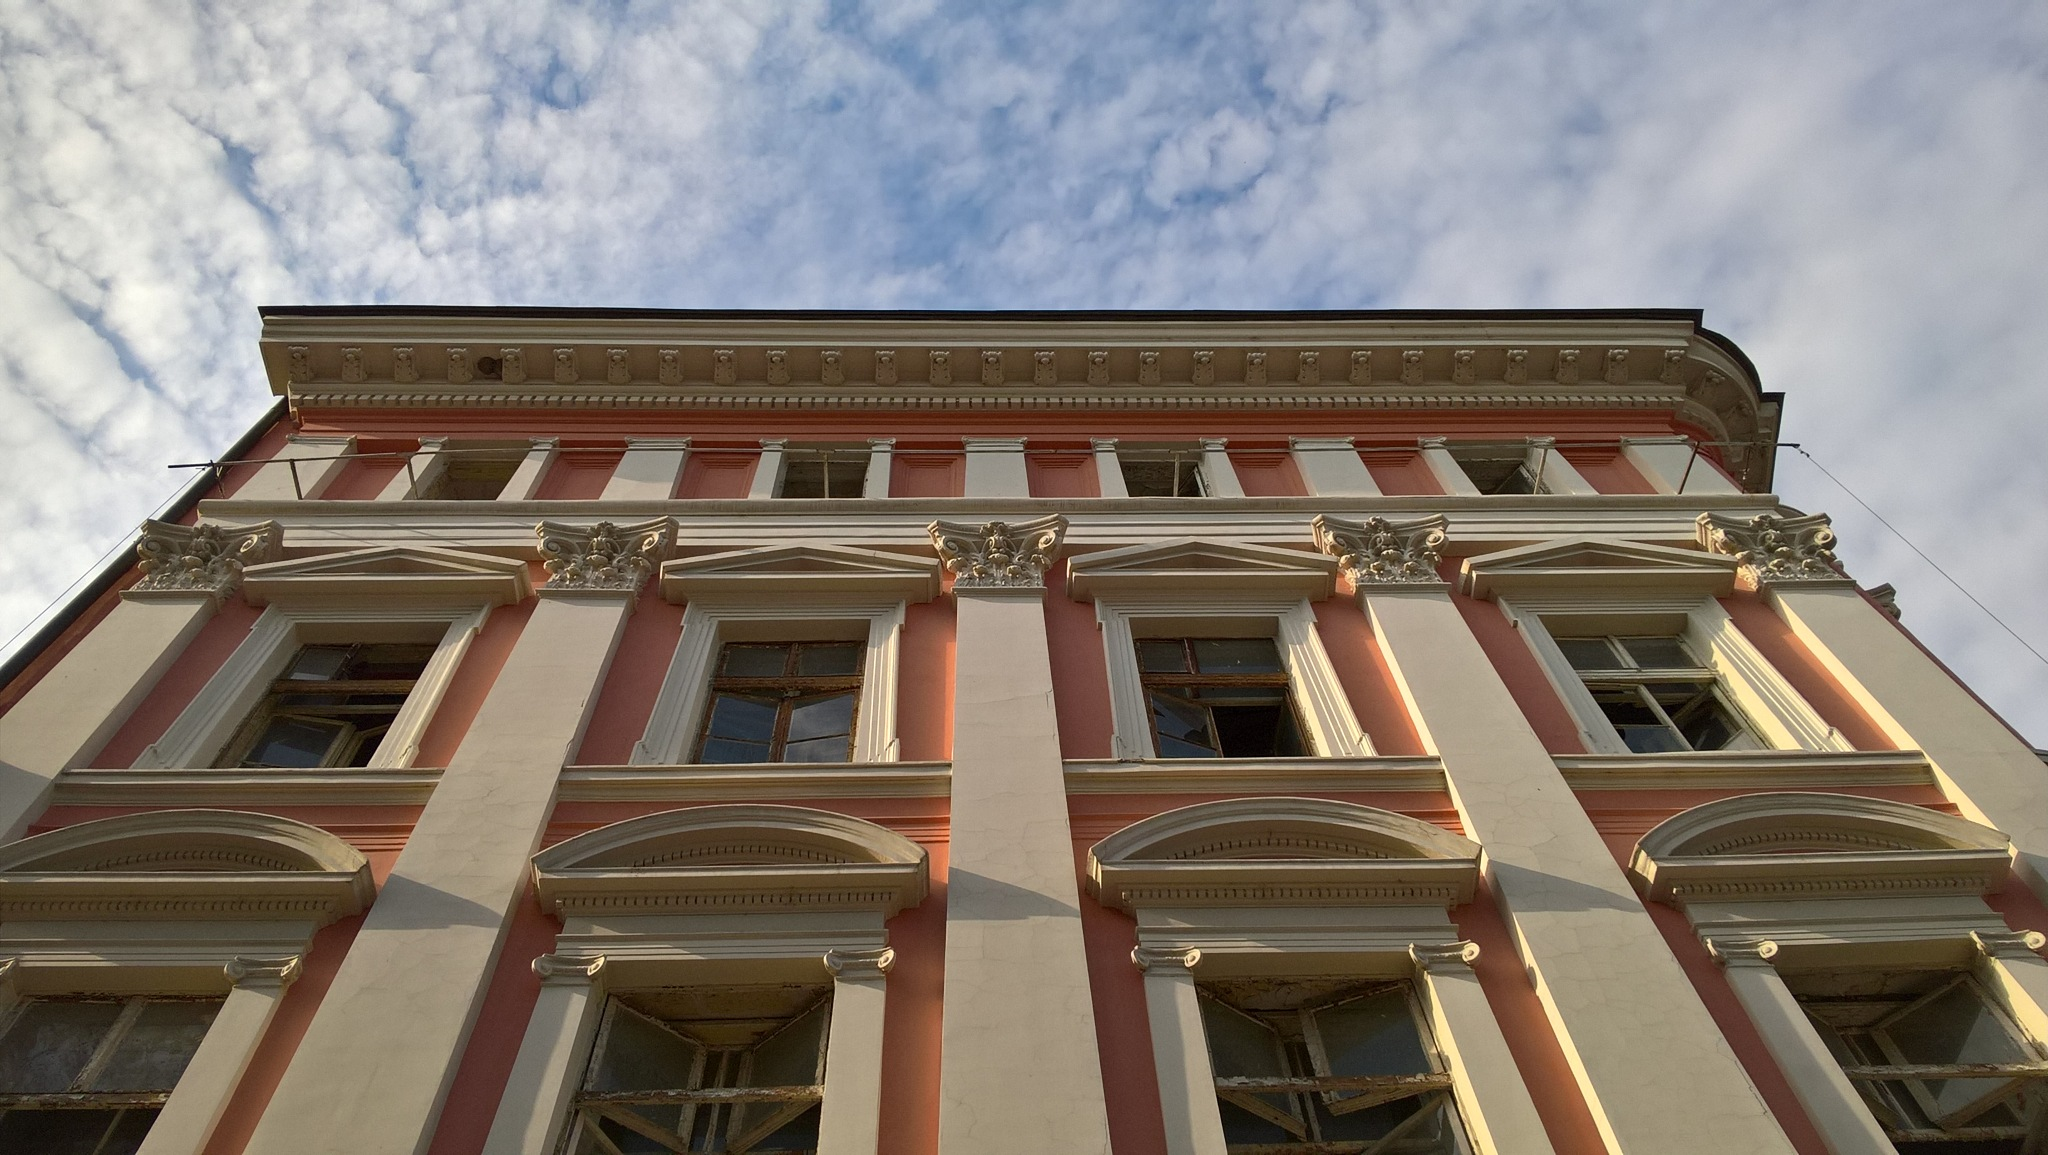 House (HDR) by Krasi Asenov